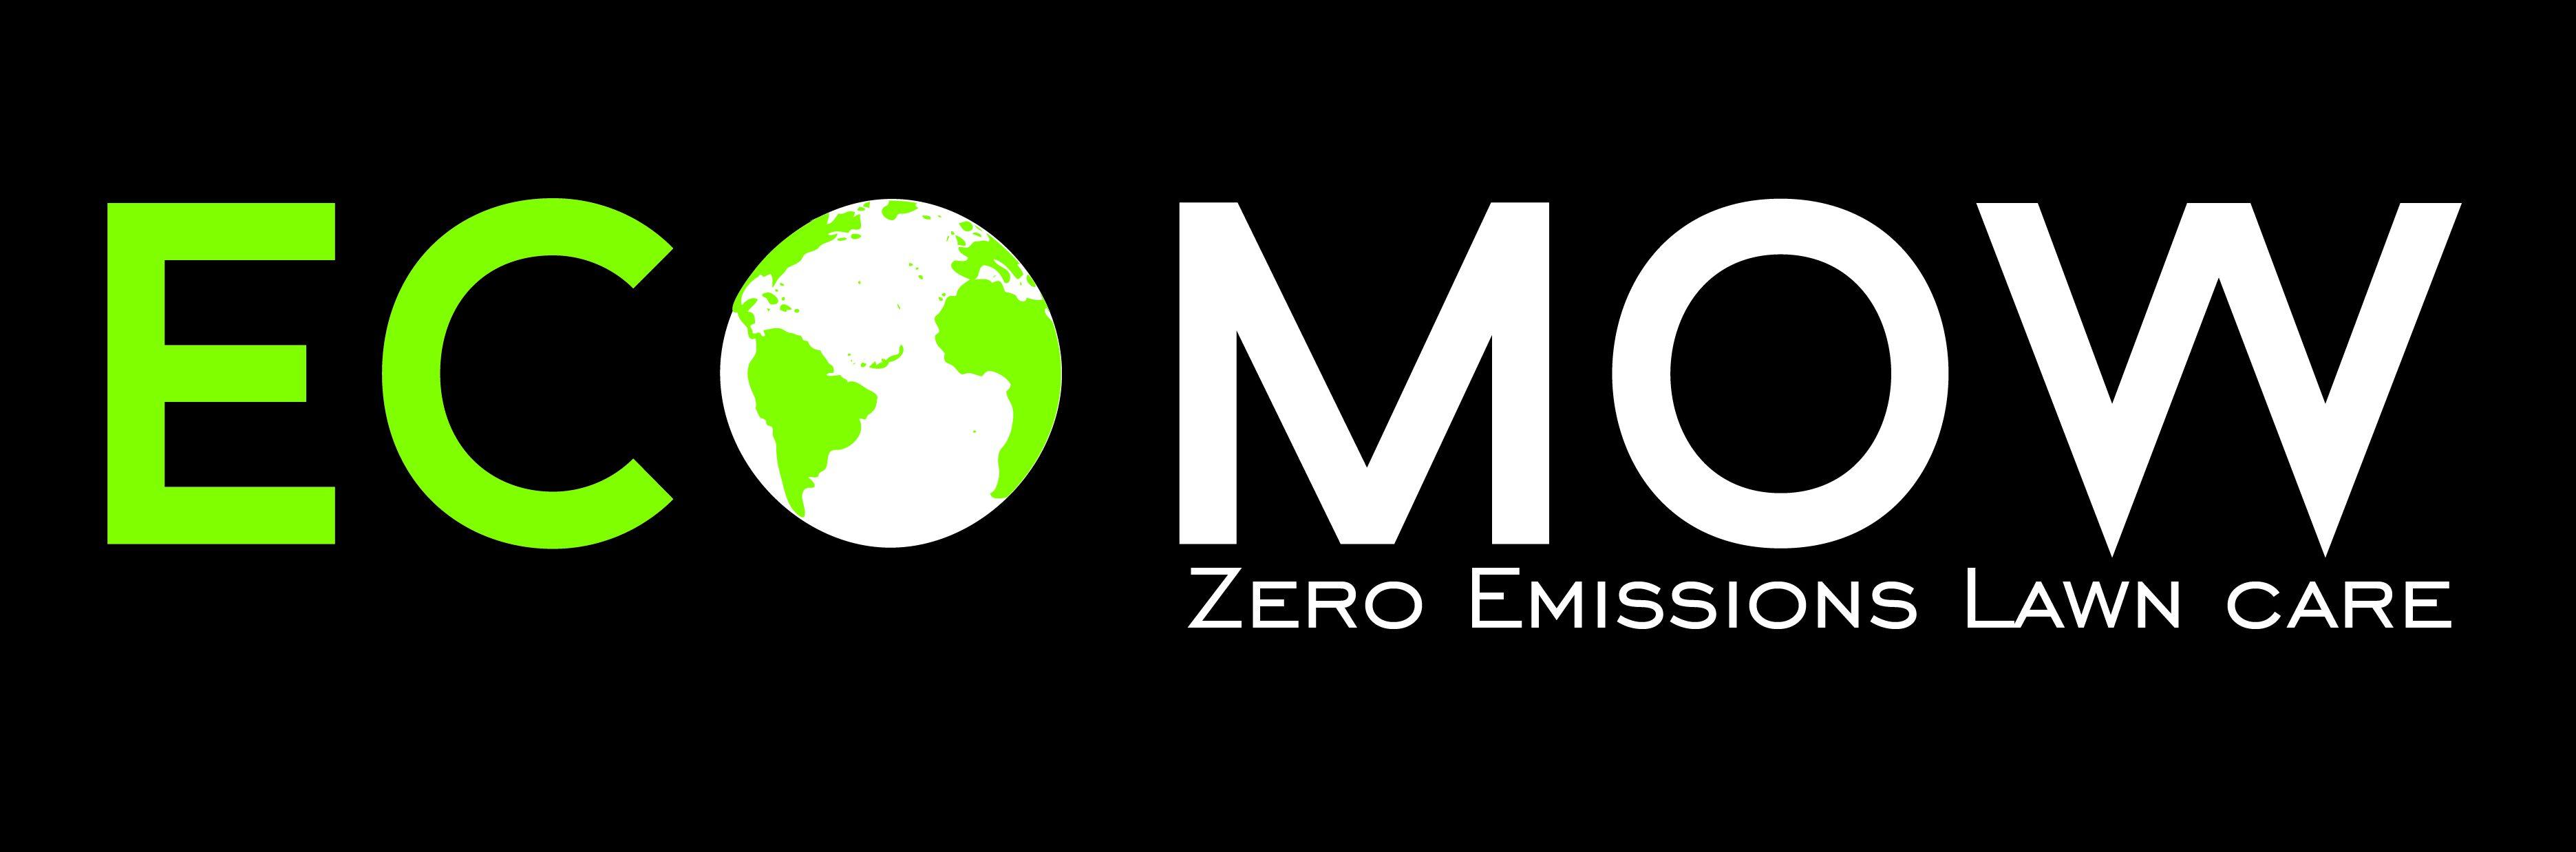 Eco Mow LLC